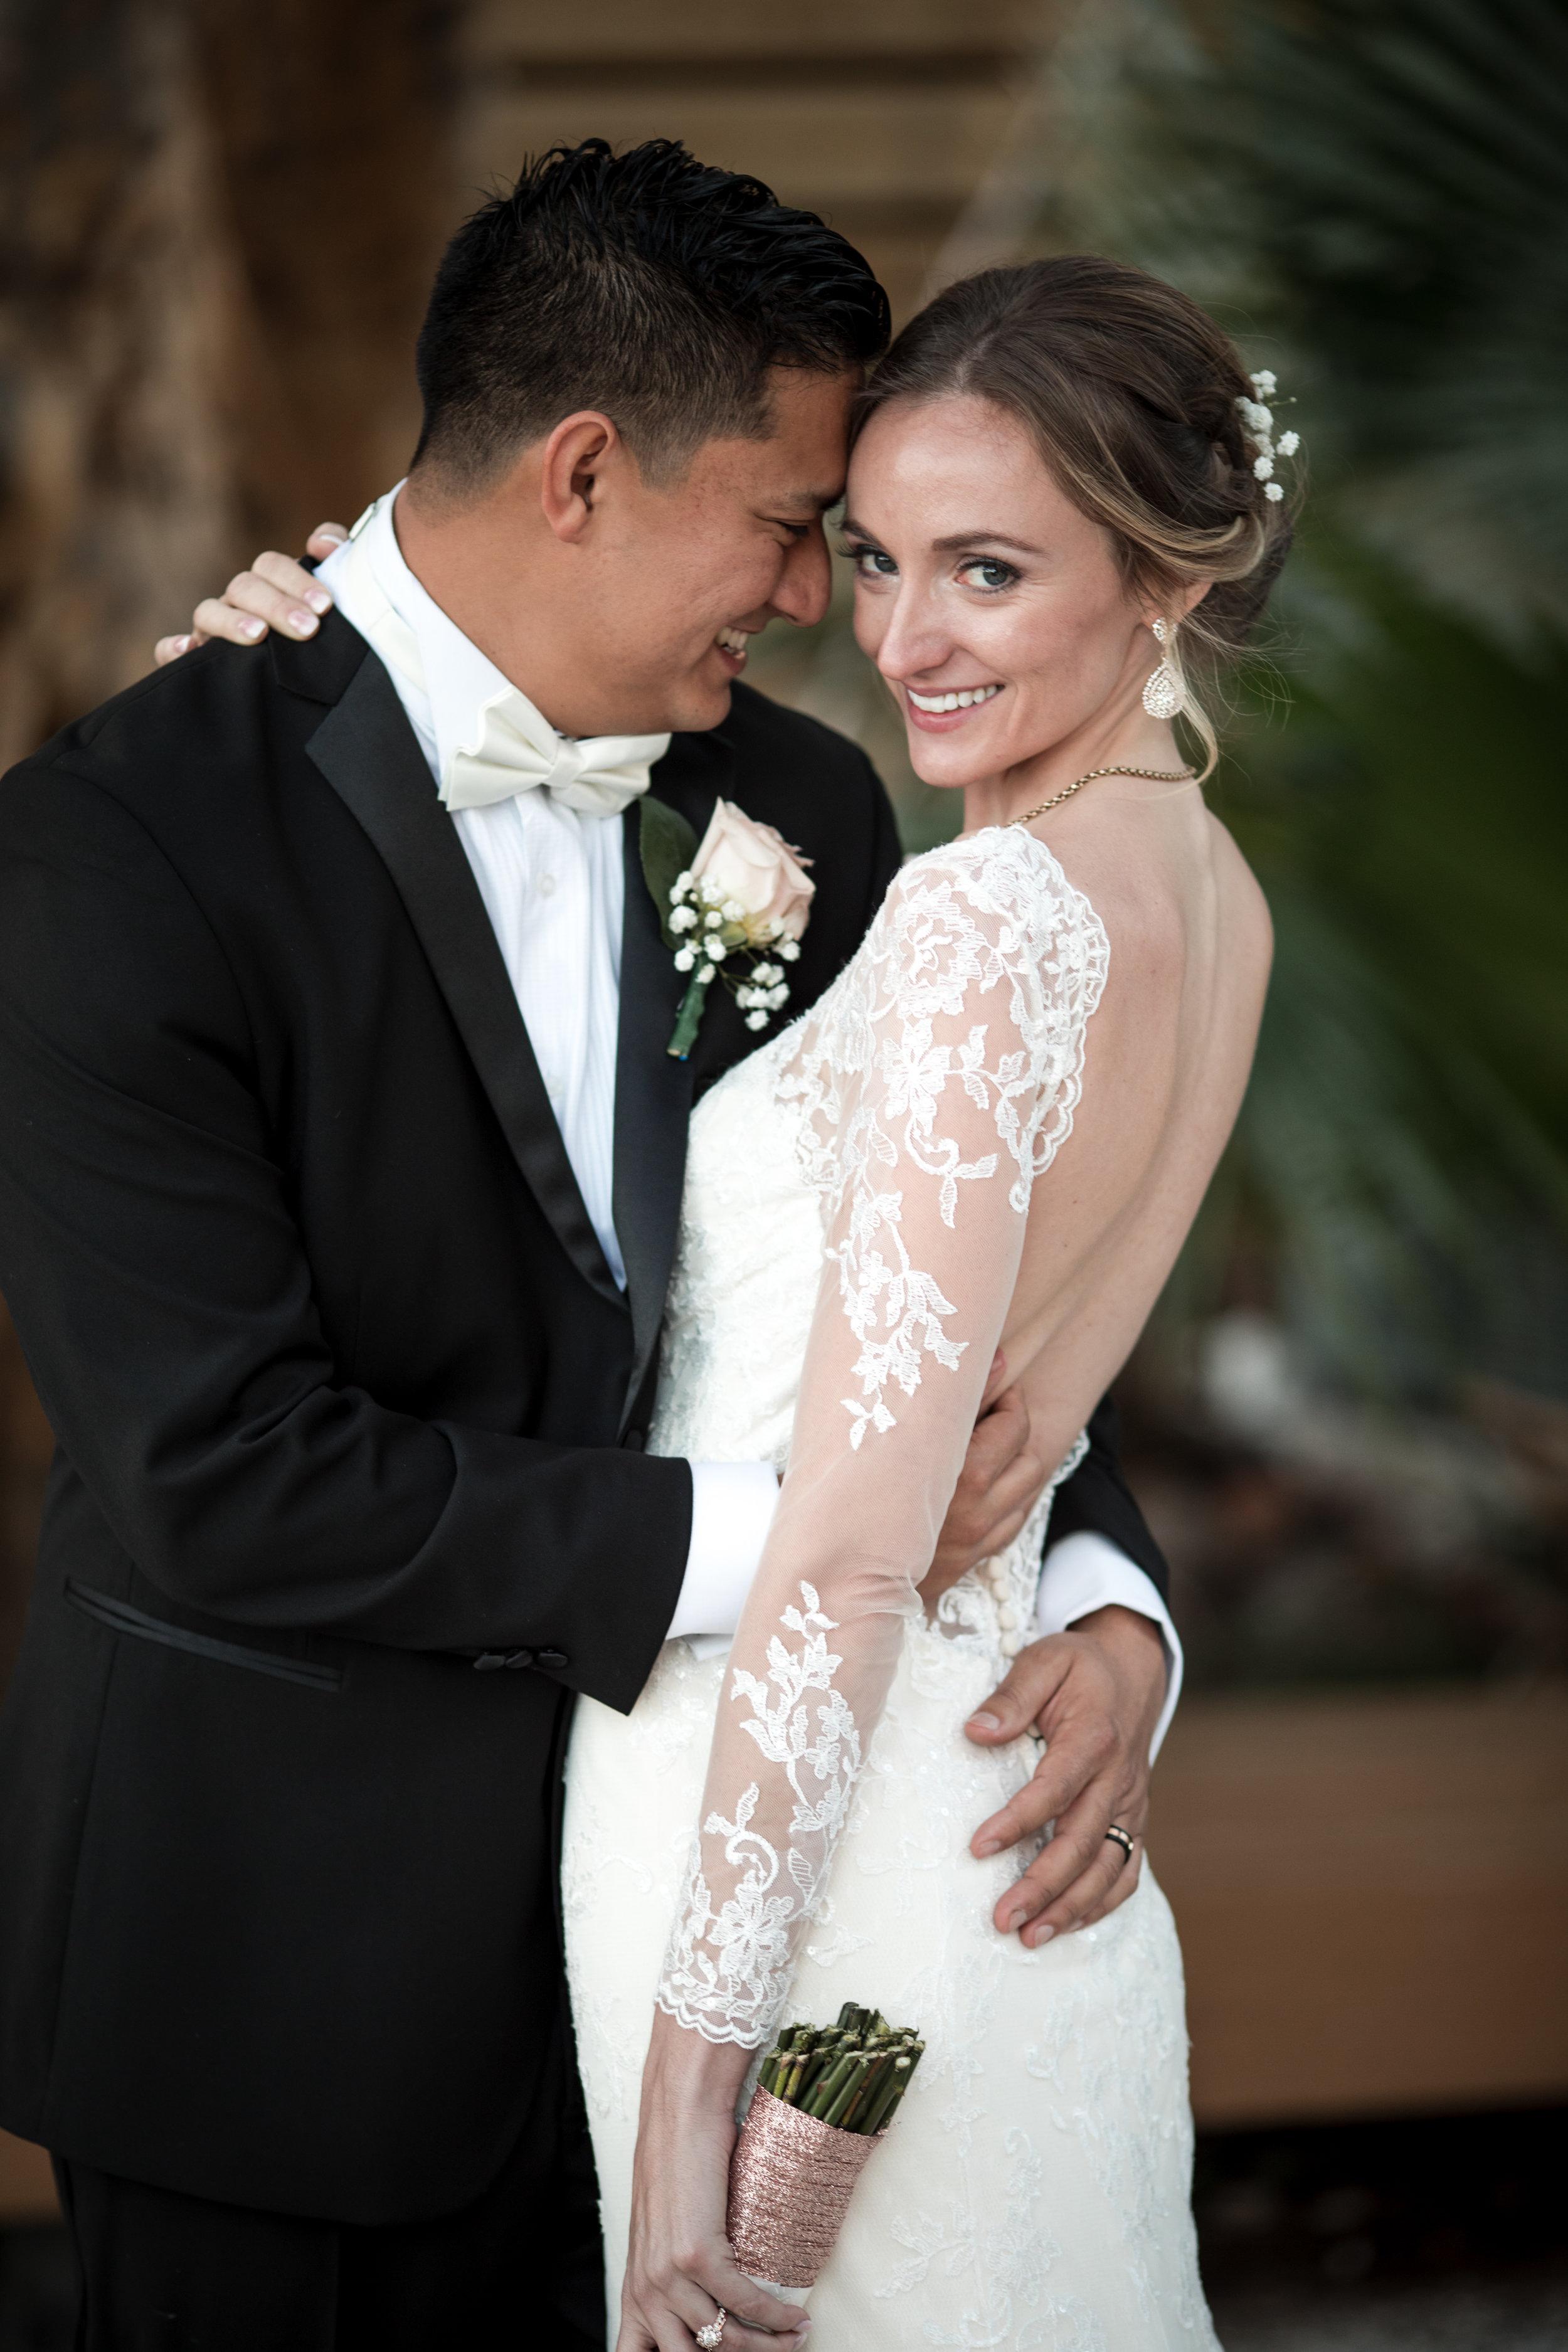 Kim & ARMAN - WEDDING AT STRANAHAN HOUSE, FORT LAUDERDALE FLORIDA